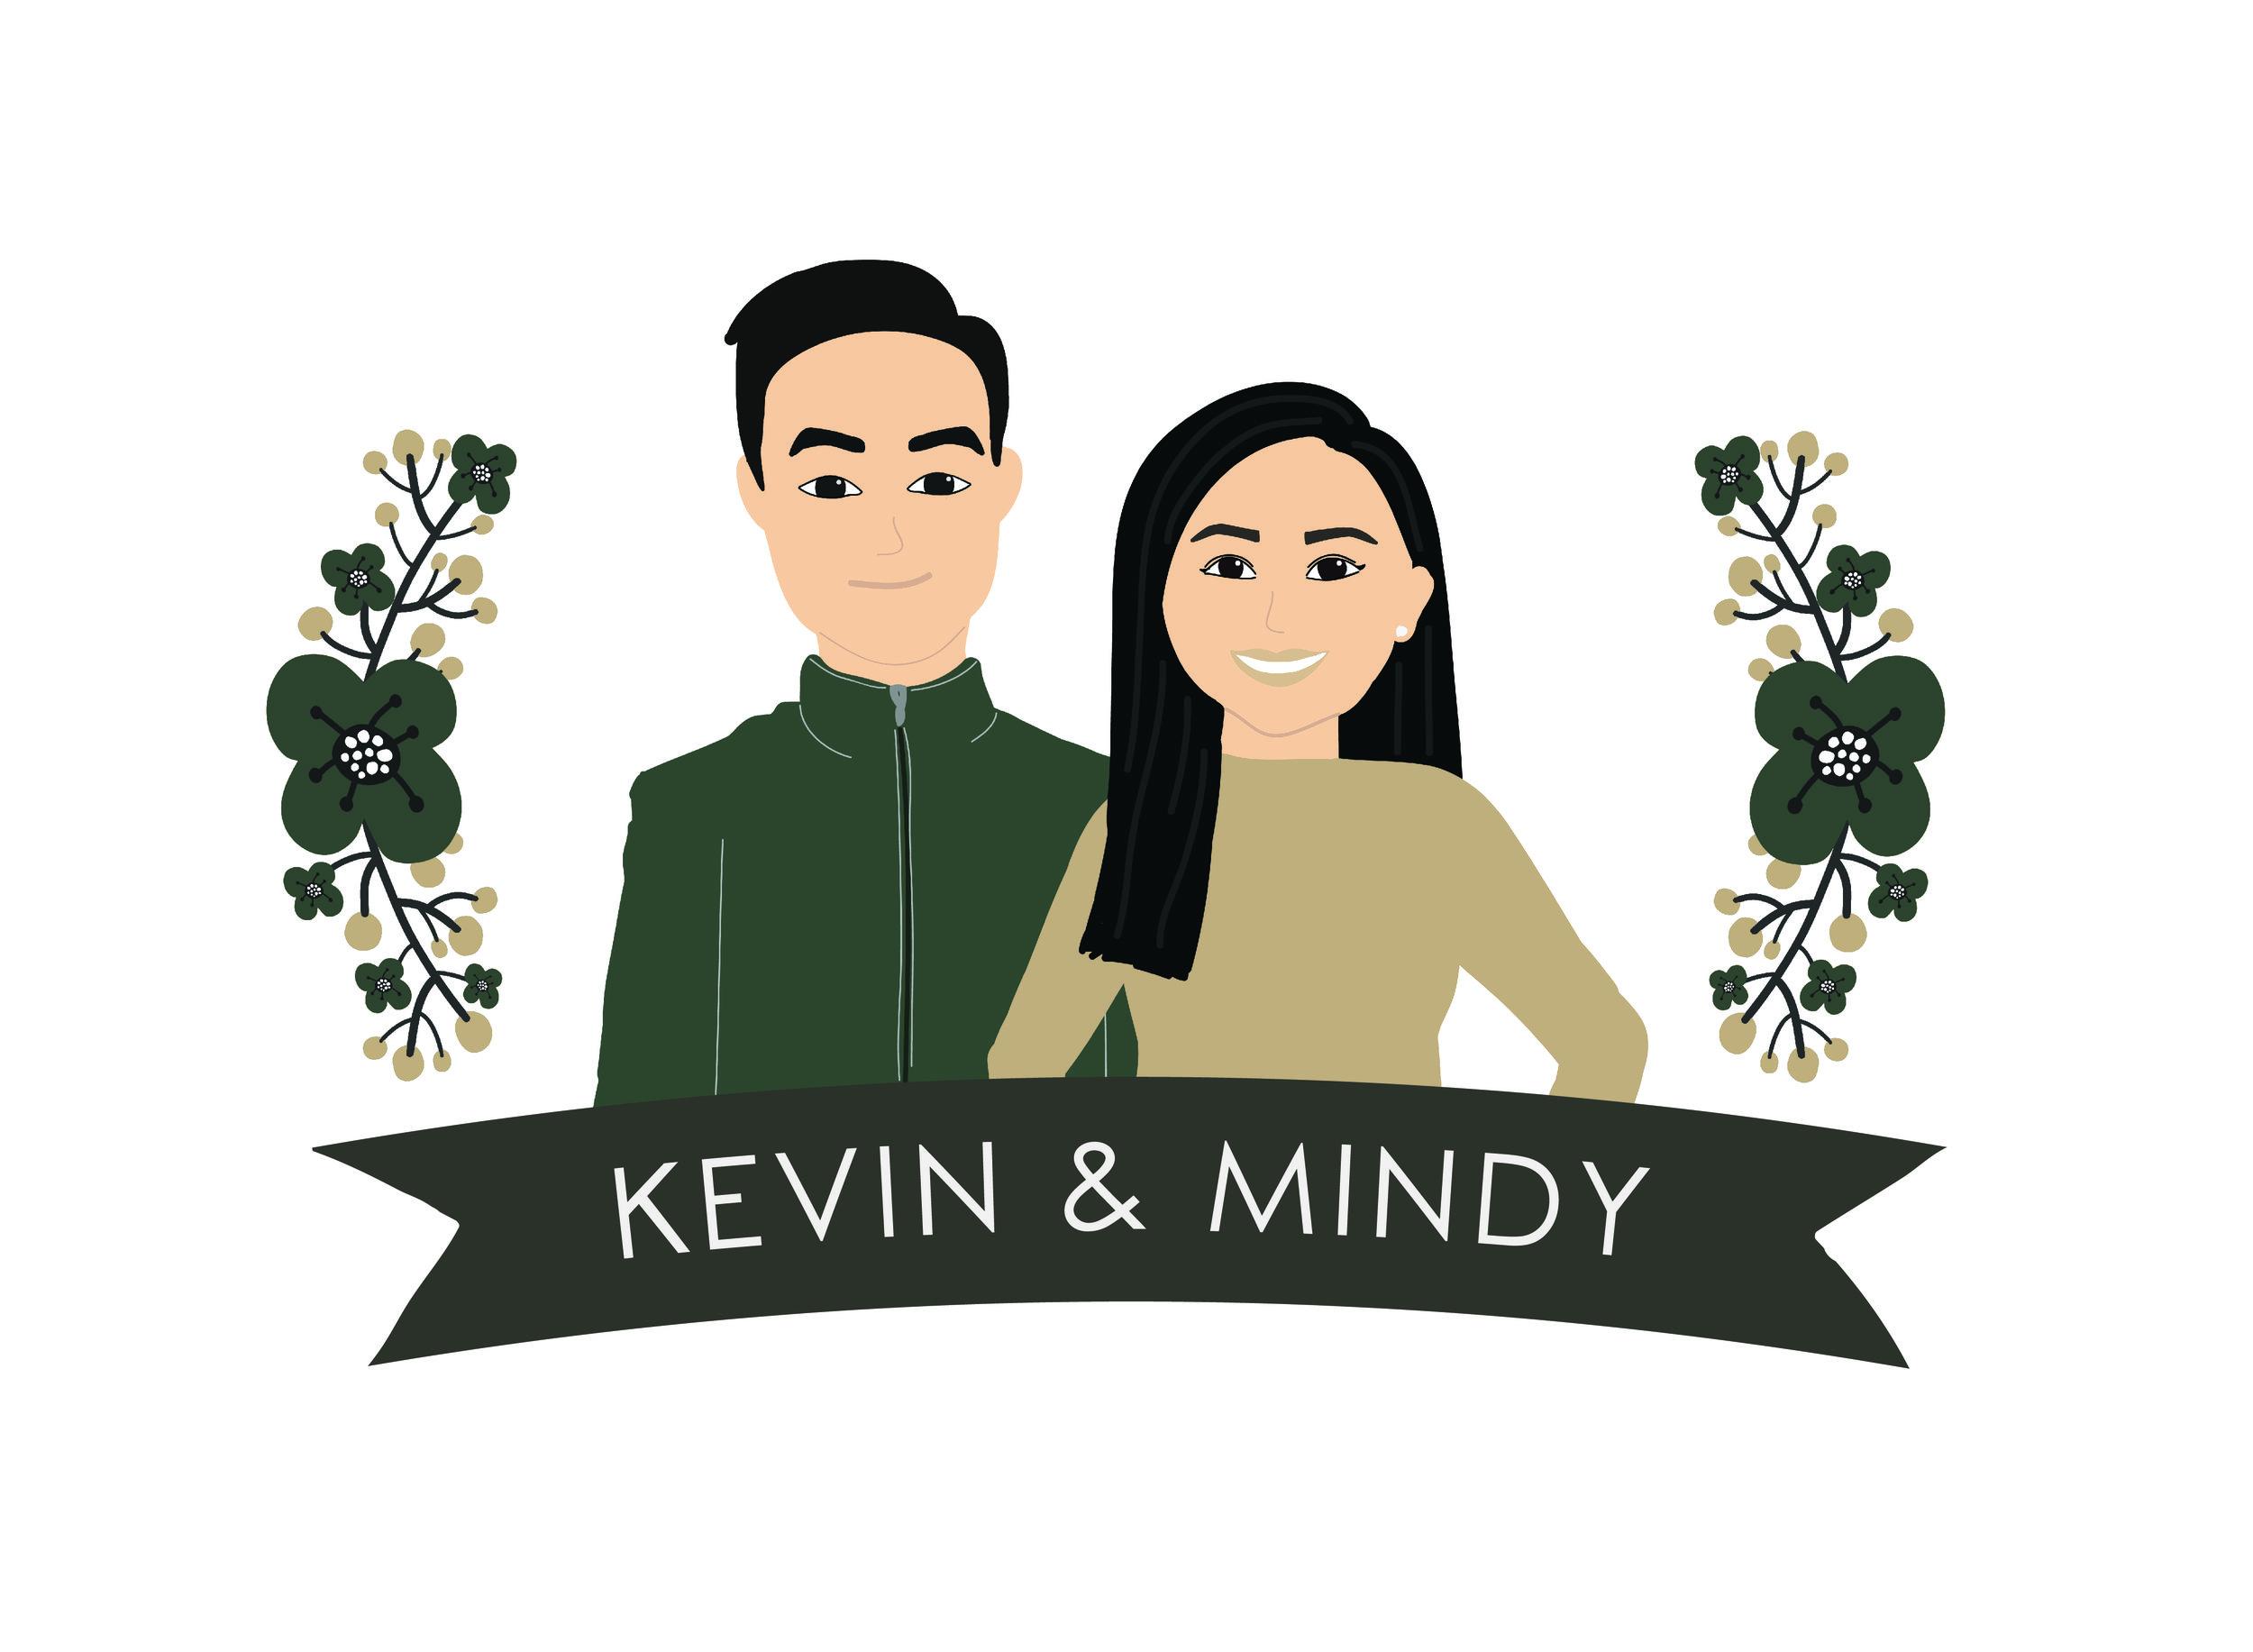 Kevin & Mindy-02.jpg